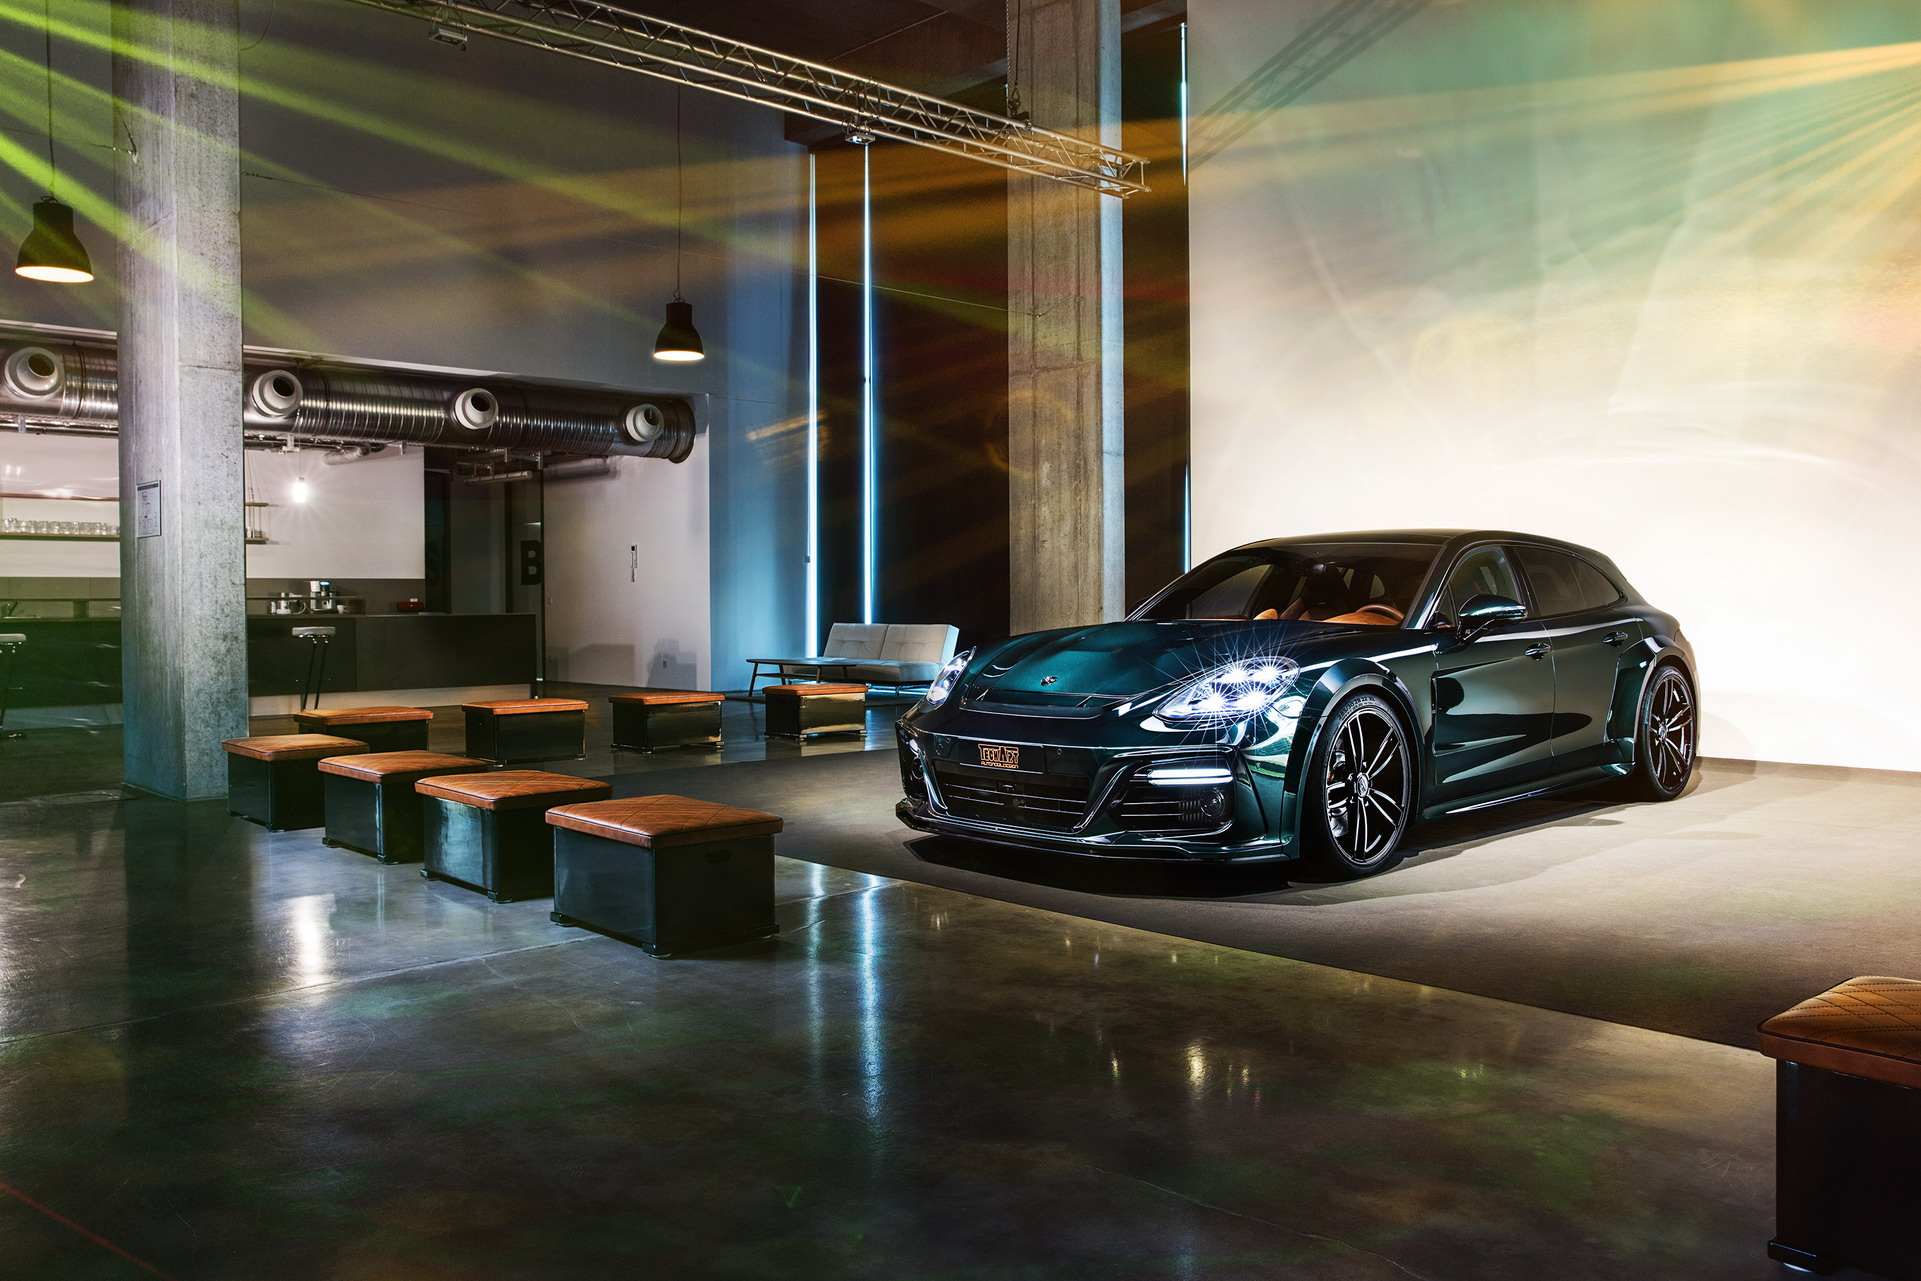 Porsche_Panamera_Sport_Turismo_GrandGT_by_TechArt0000